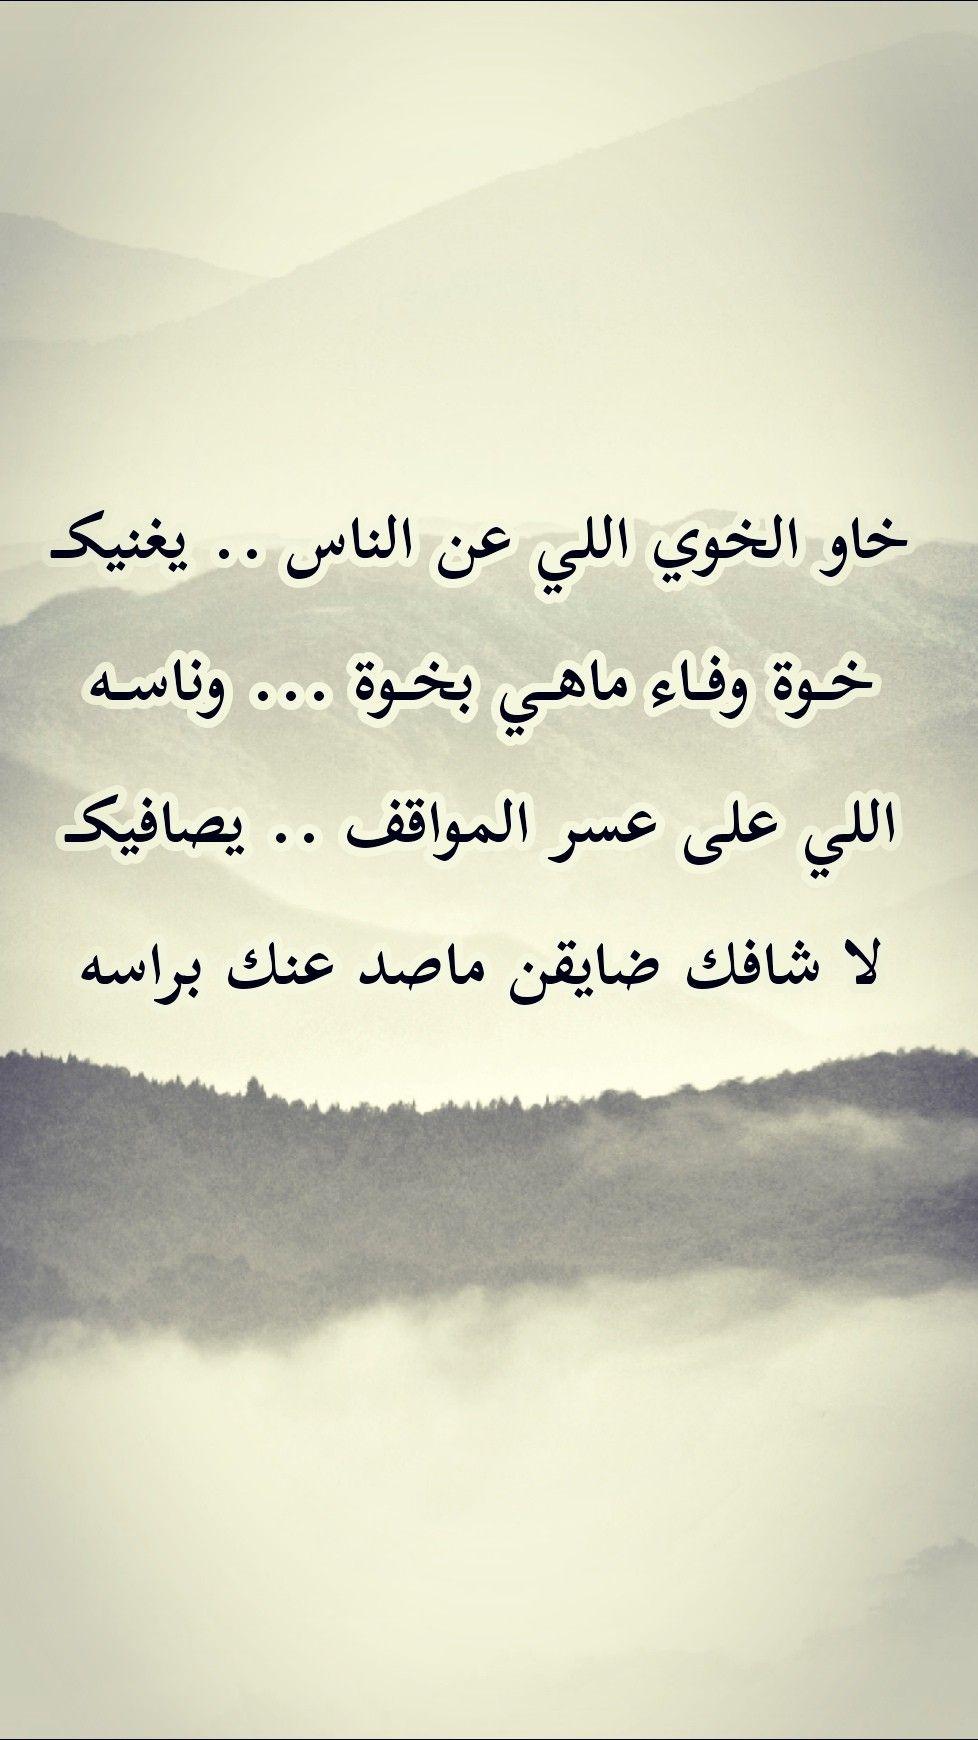 Pin By Isam Alshiekh On أقوال و أشعار Calligraphy Arabic Calligraphy